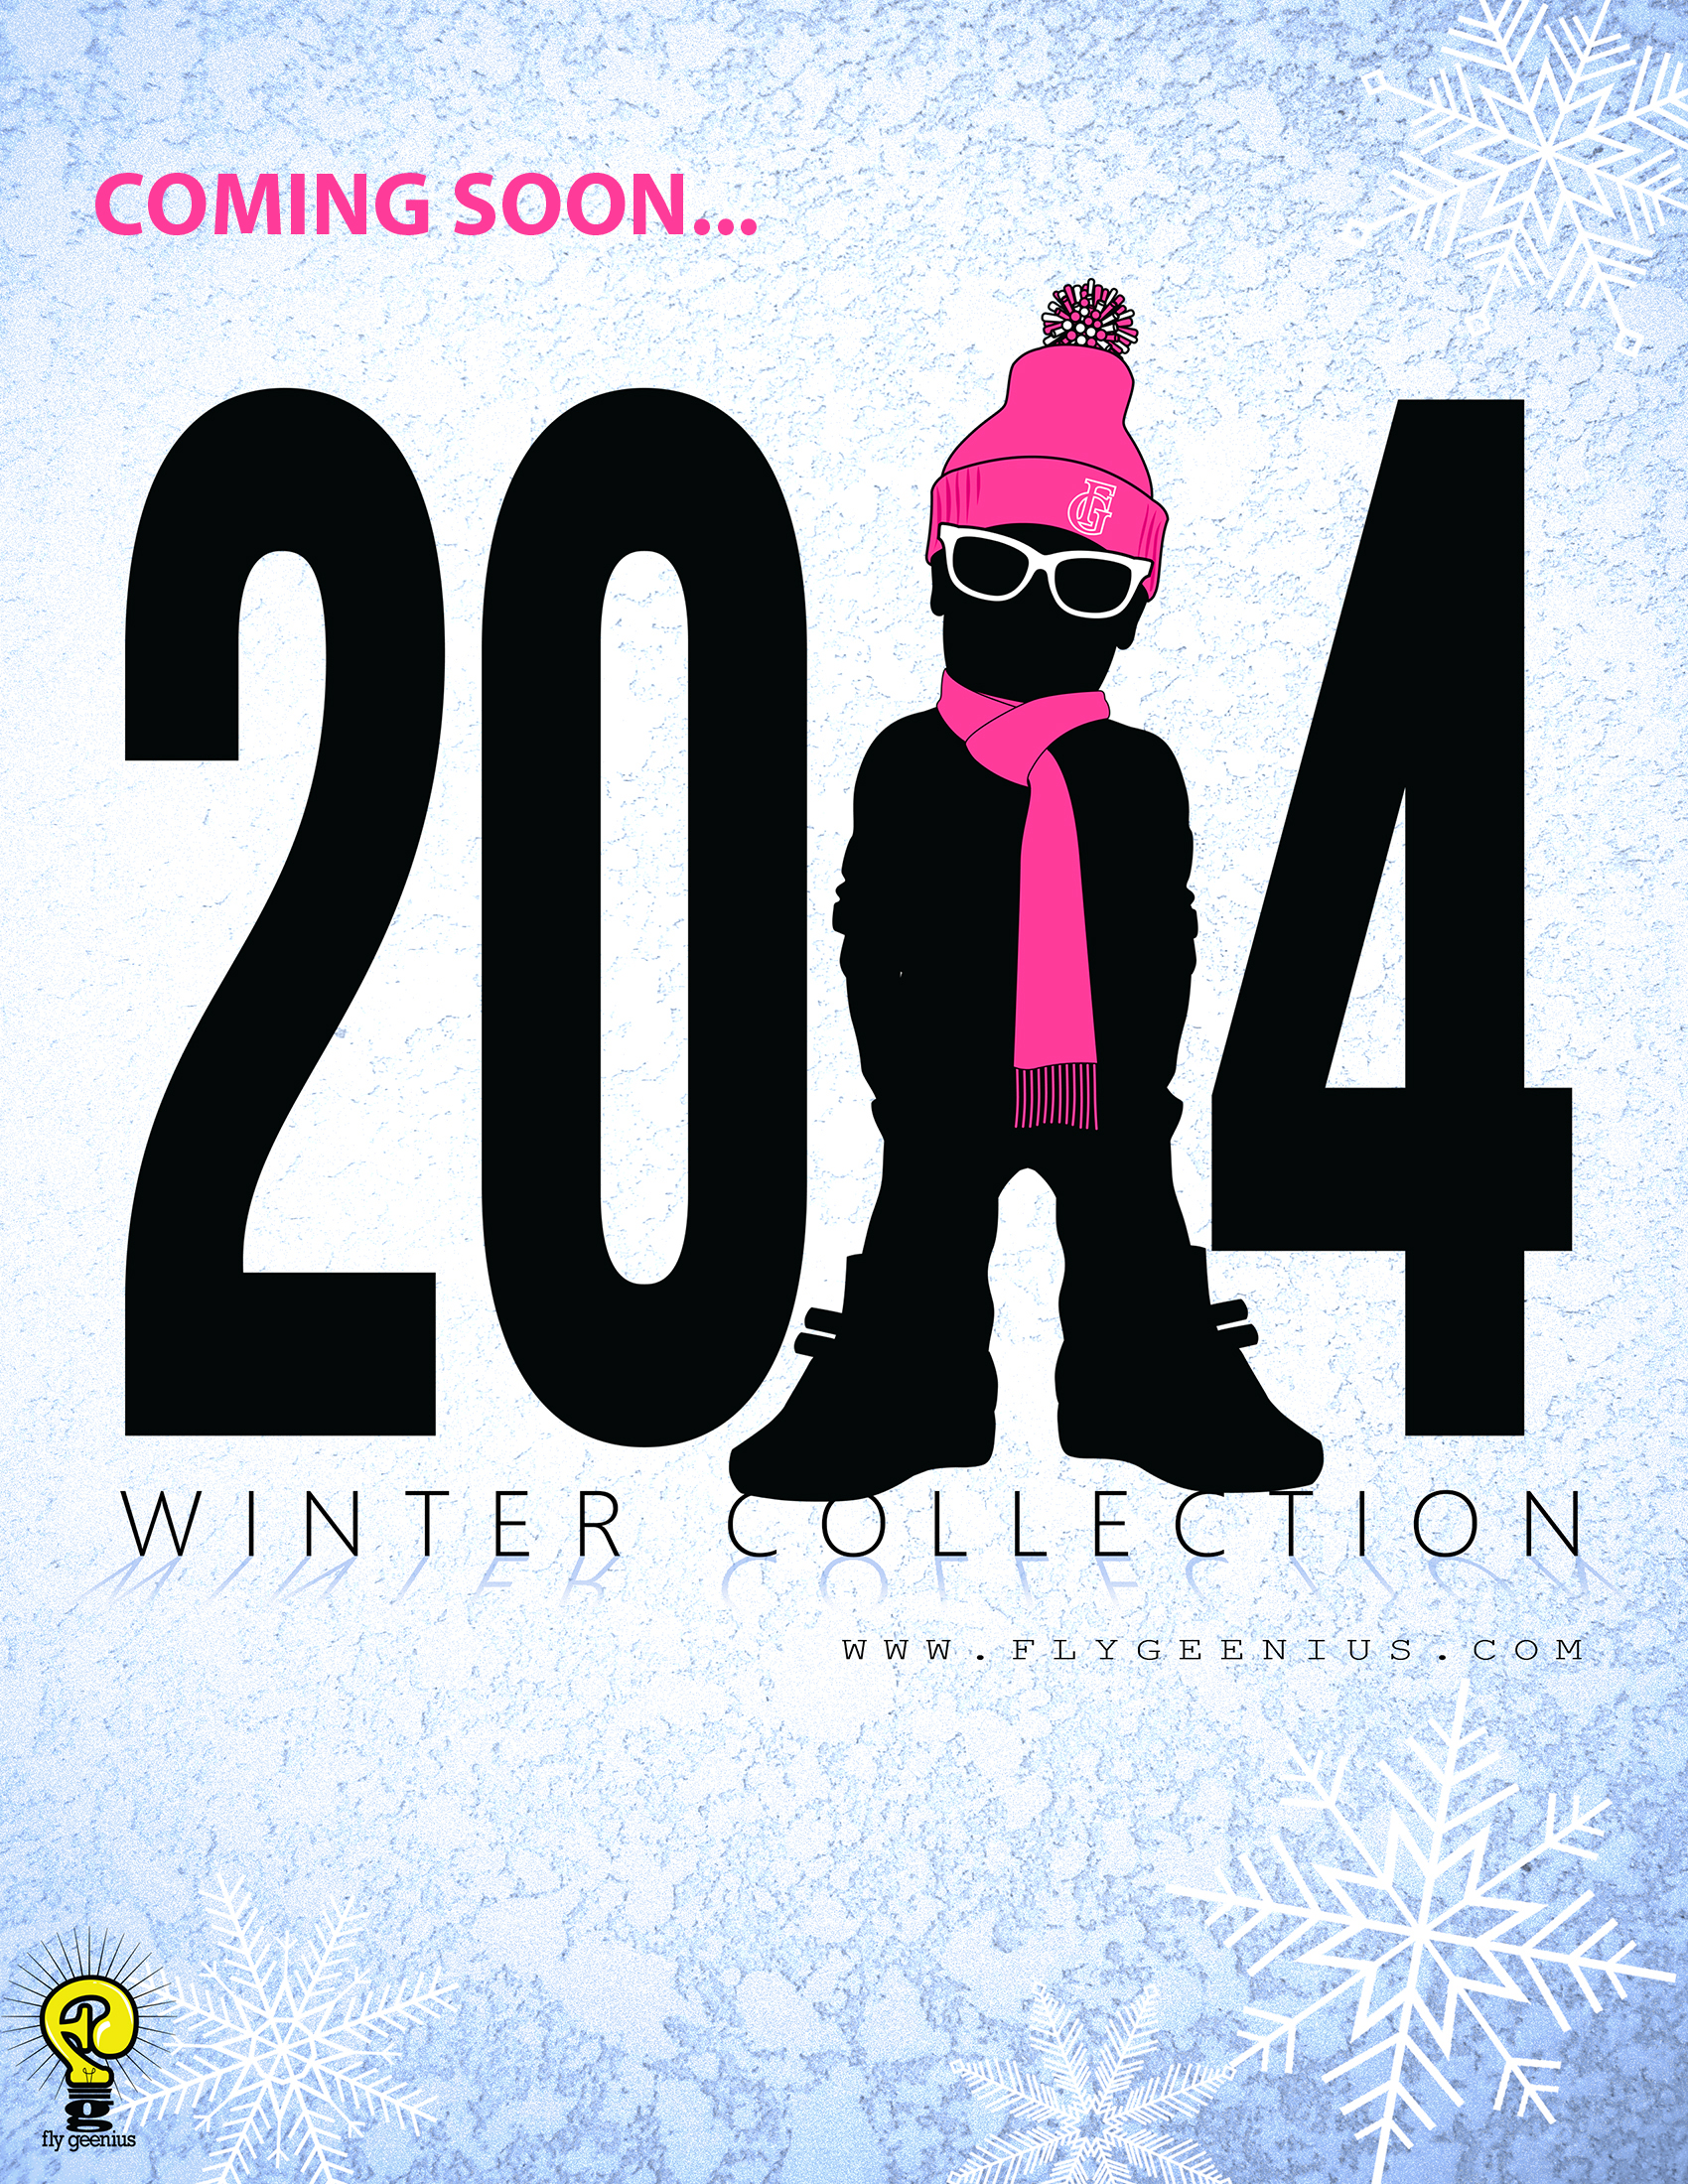 Winter2013 banner